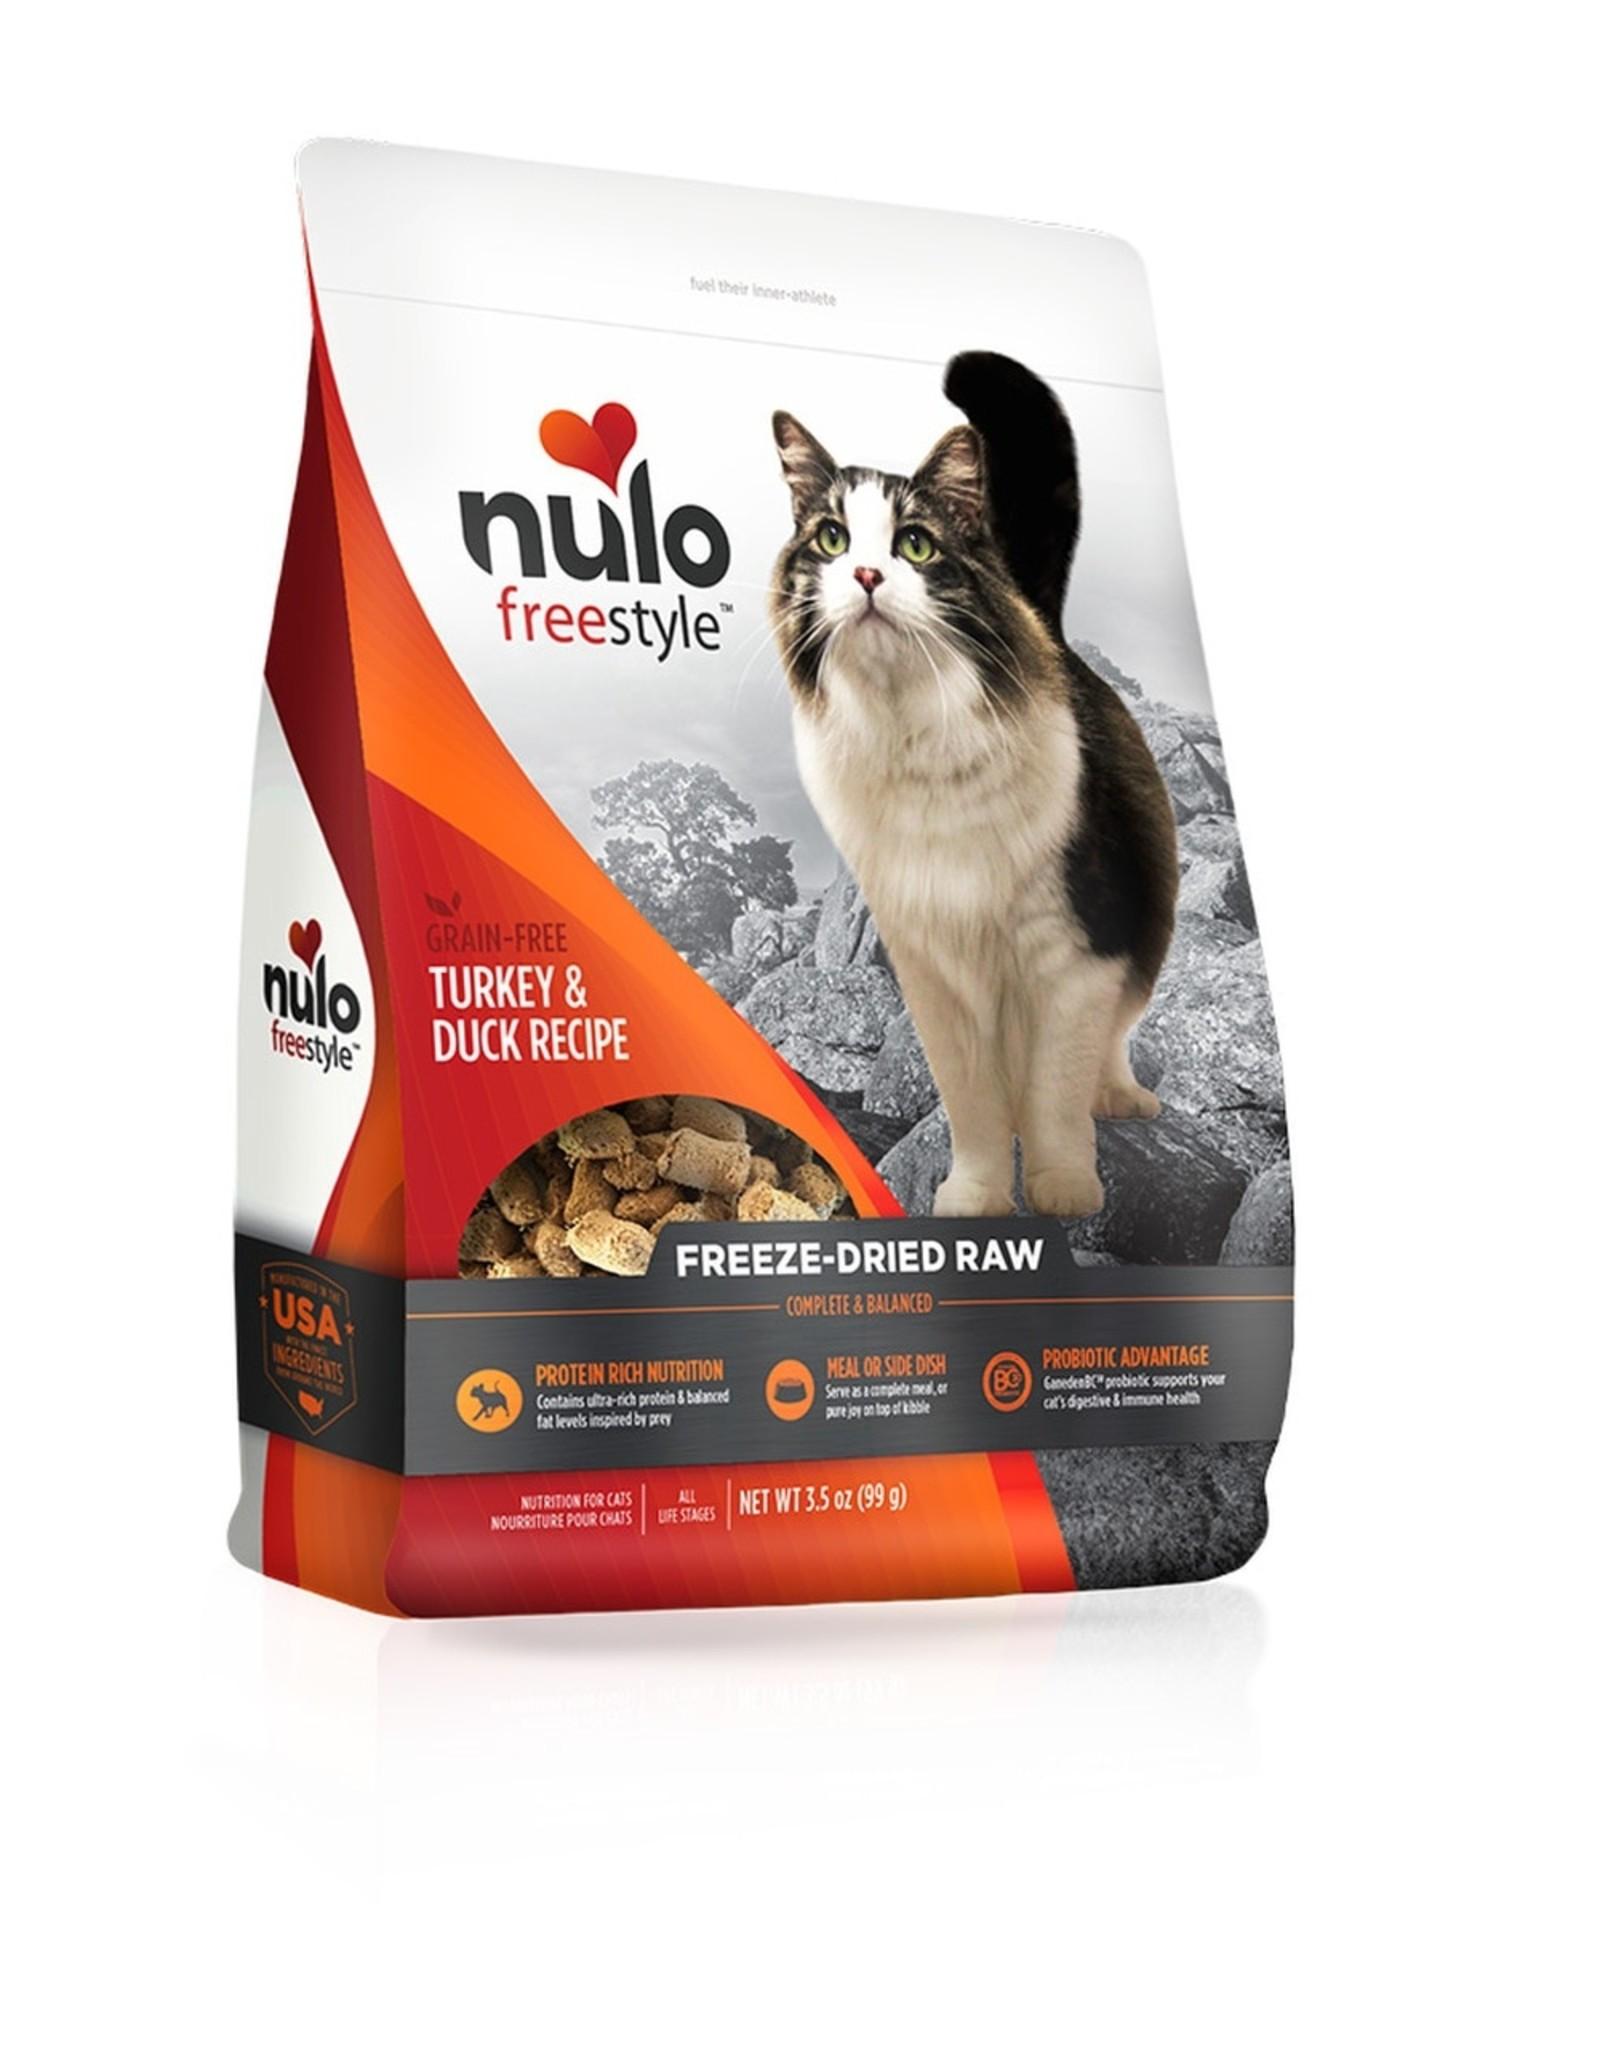 Nulo Freeze Dried Raw Grain Free Turkey & Duck CAT Food 3.5 oz